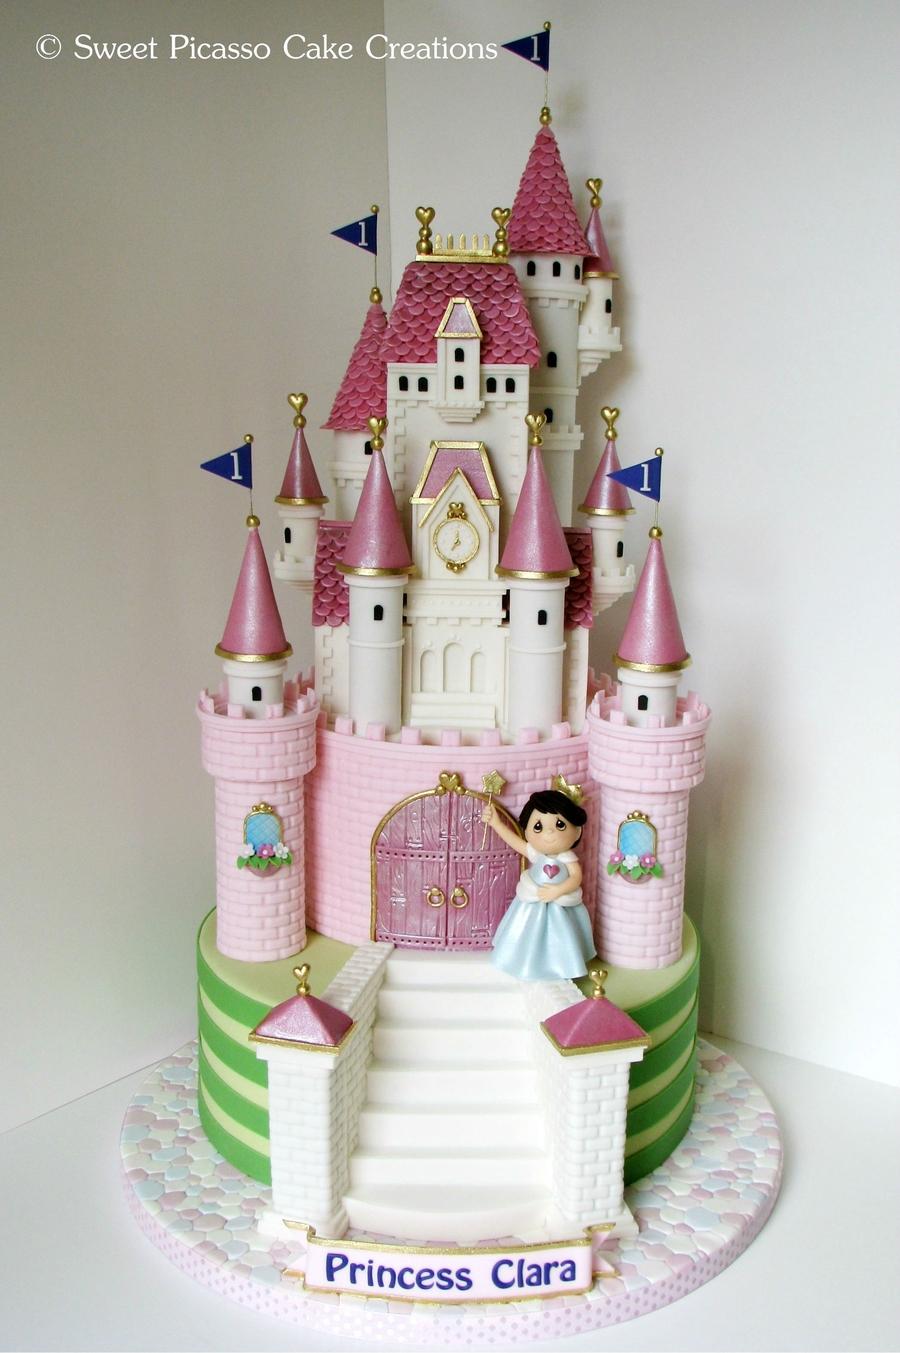 Pictures Of Princess Castle Cake : Princess Pink Castle Cake - CakeCentral.com